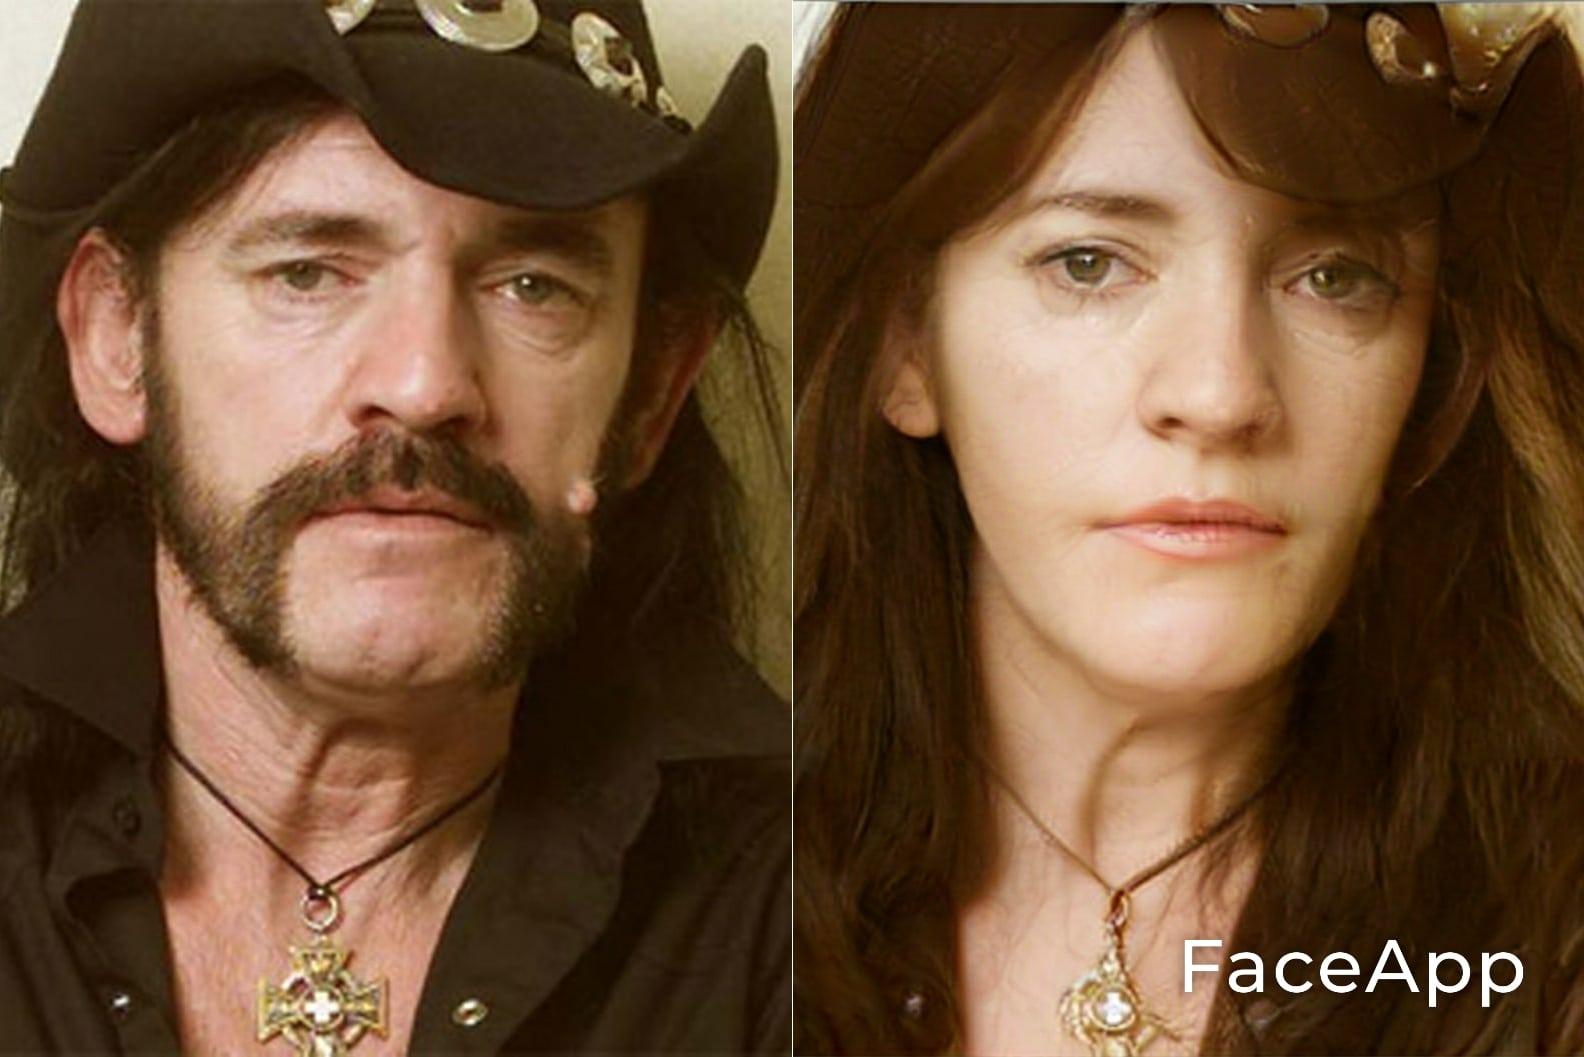 Lemmy FaceApp